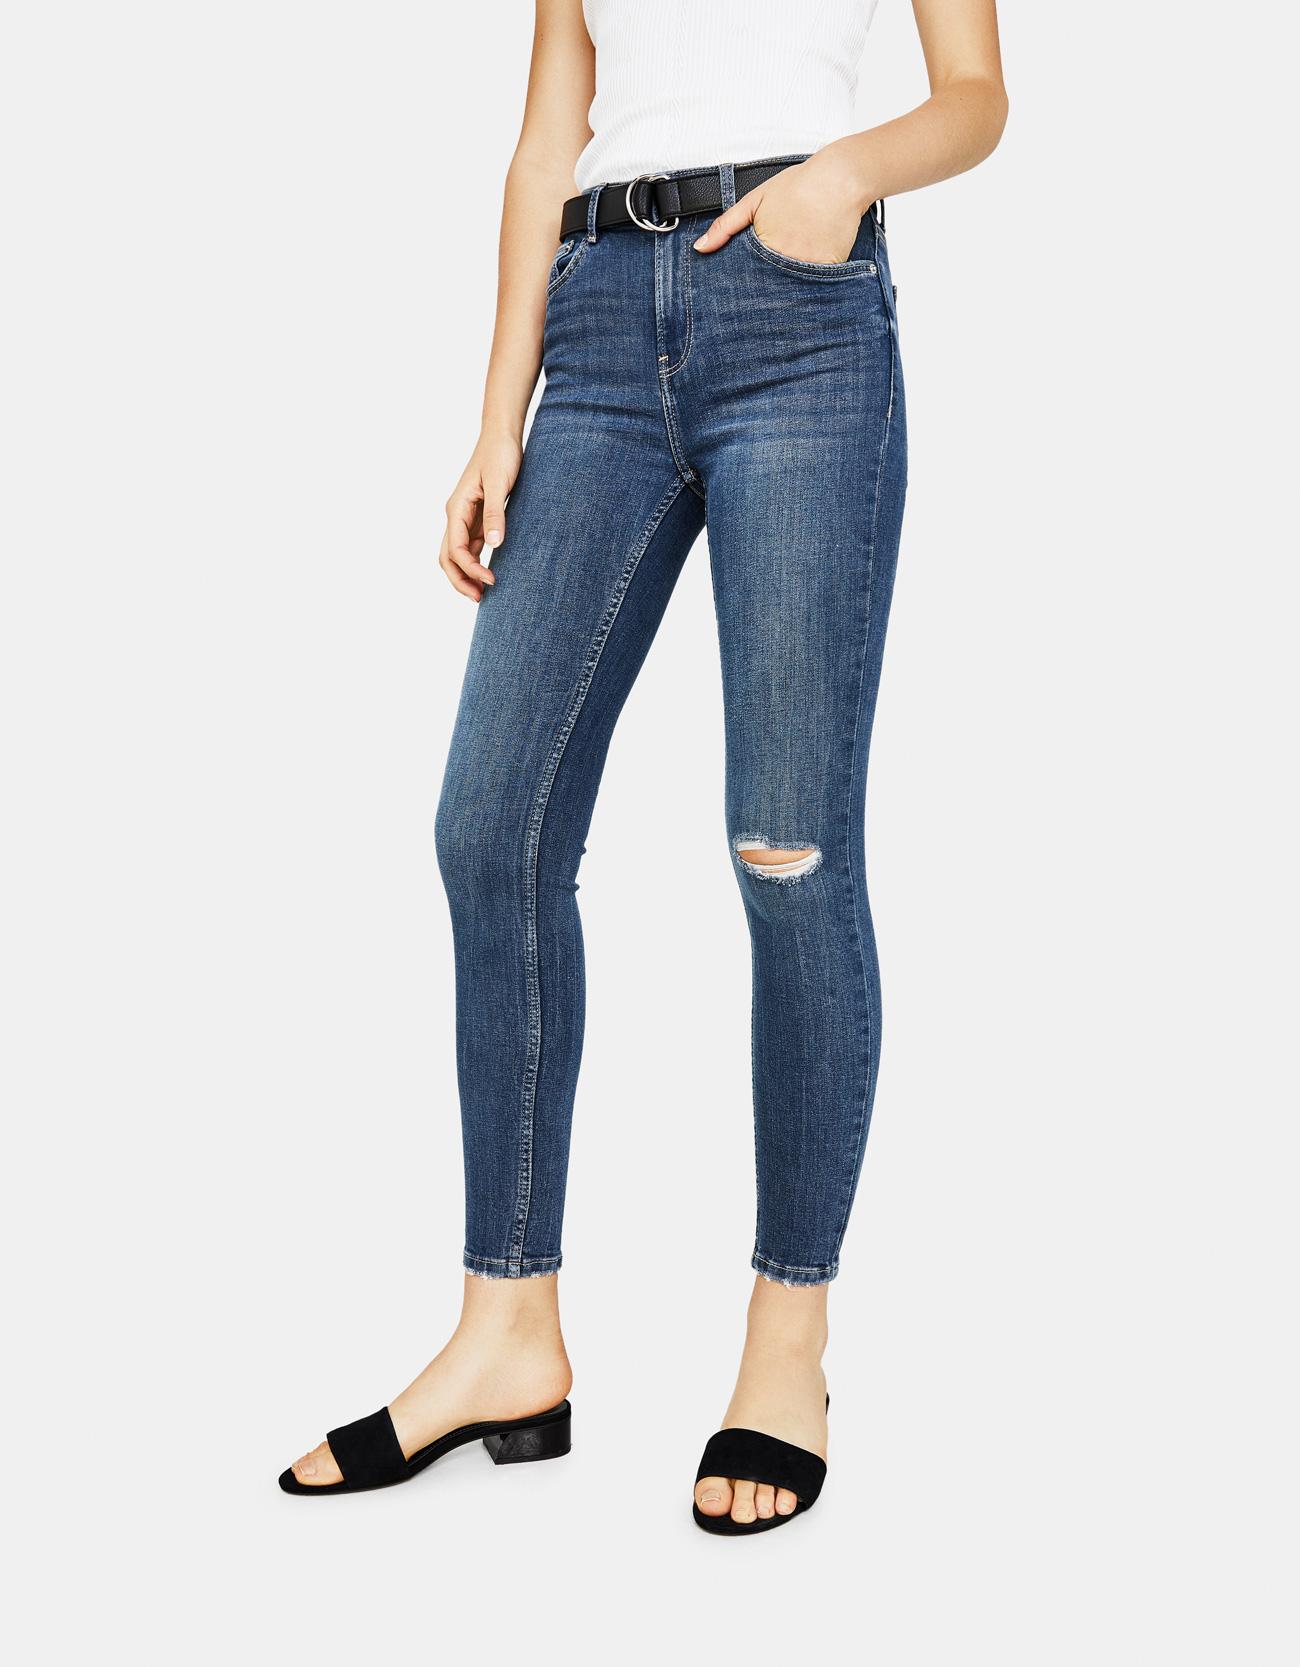 c1c8b72e366 Mid waist skinny jeans with five pockets - null - Bershka Ecuador